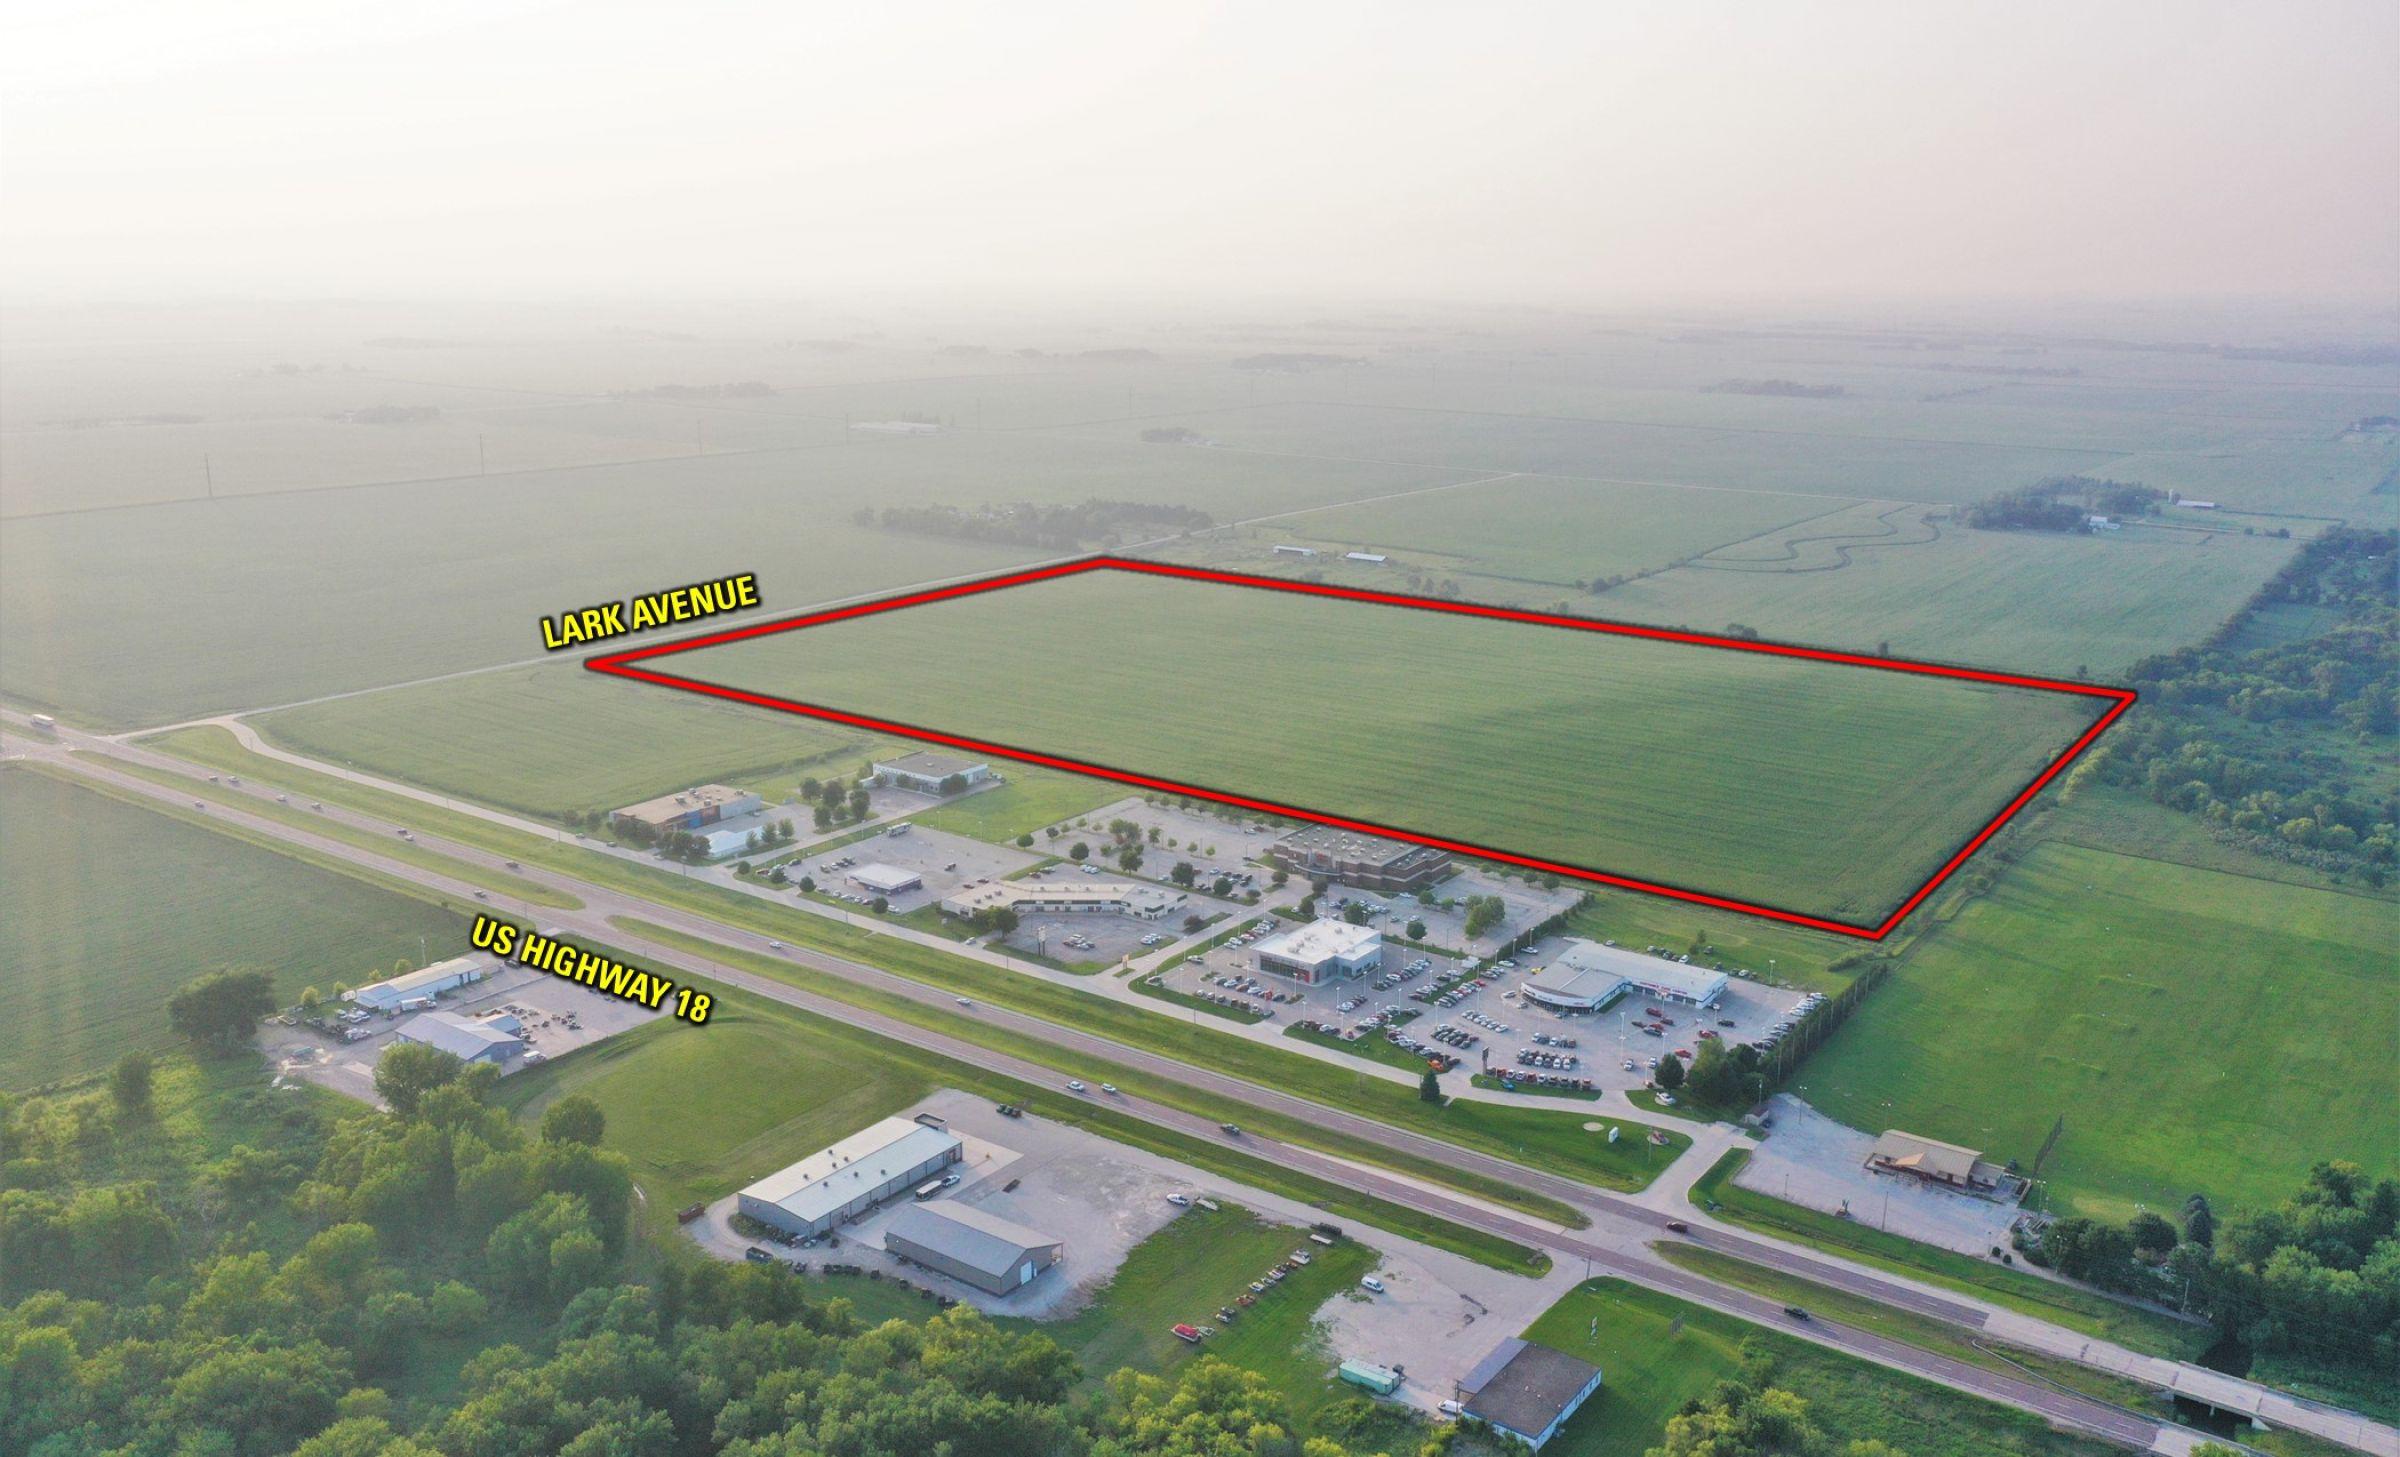 development-land-commercial-cerro-gordo-county-iowa-108-acres-listing-number-15644-4-2021-07-20-022753.jpg